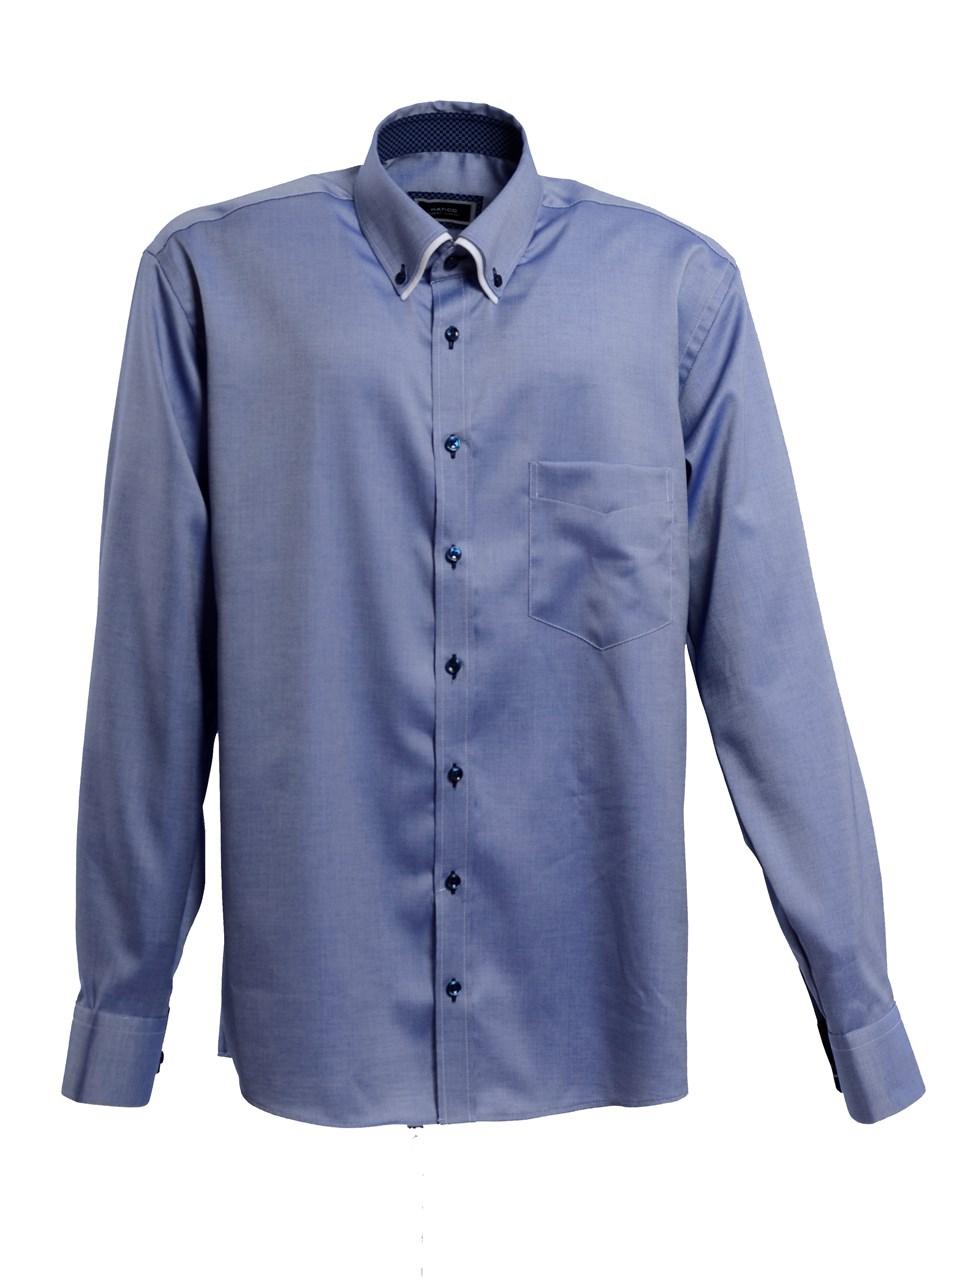 W M EGO. Modrá pánská košile s jemným vzorem HATICO f1dba1edb6